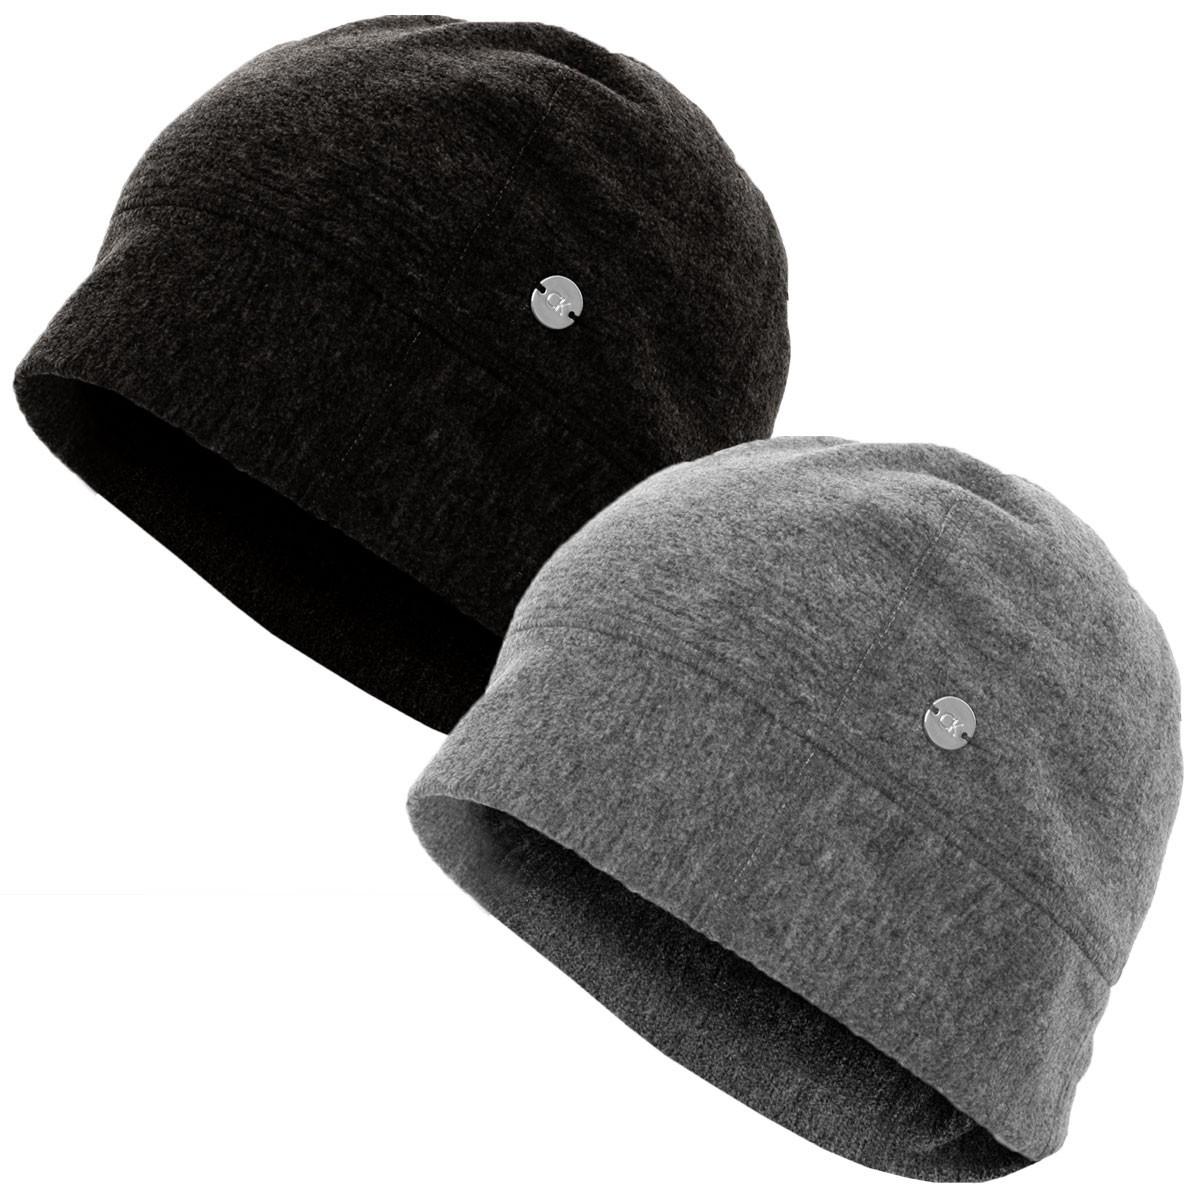 calvin klein golf 2016 womens fleece beanie headwear